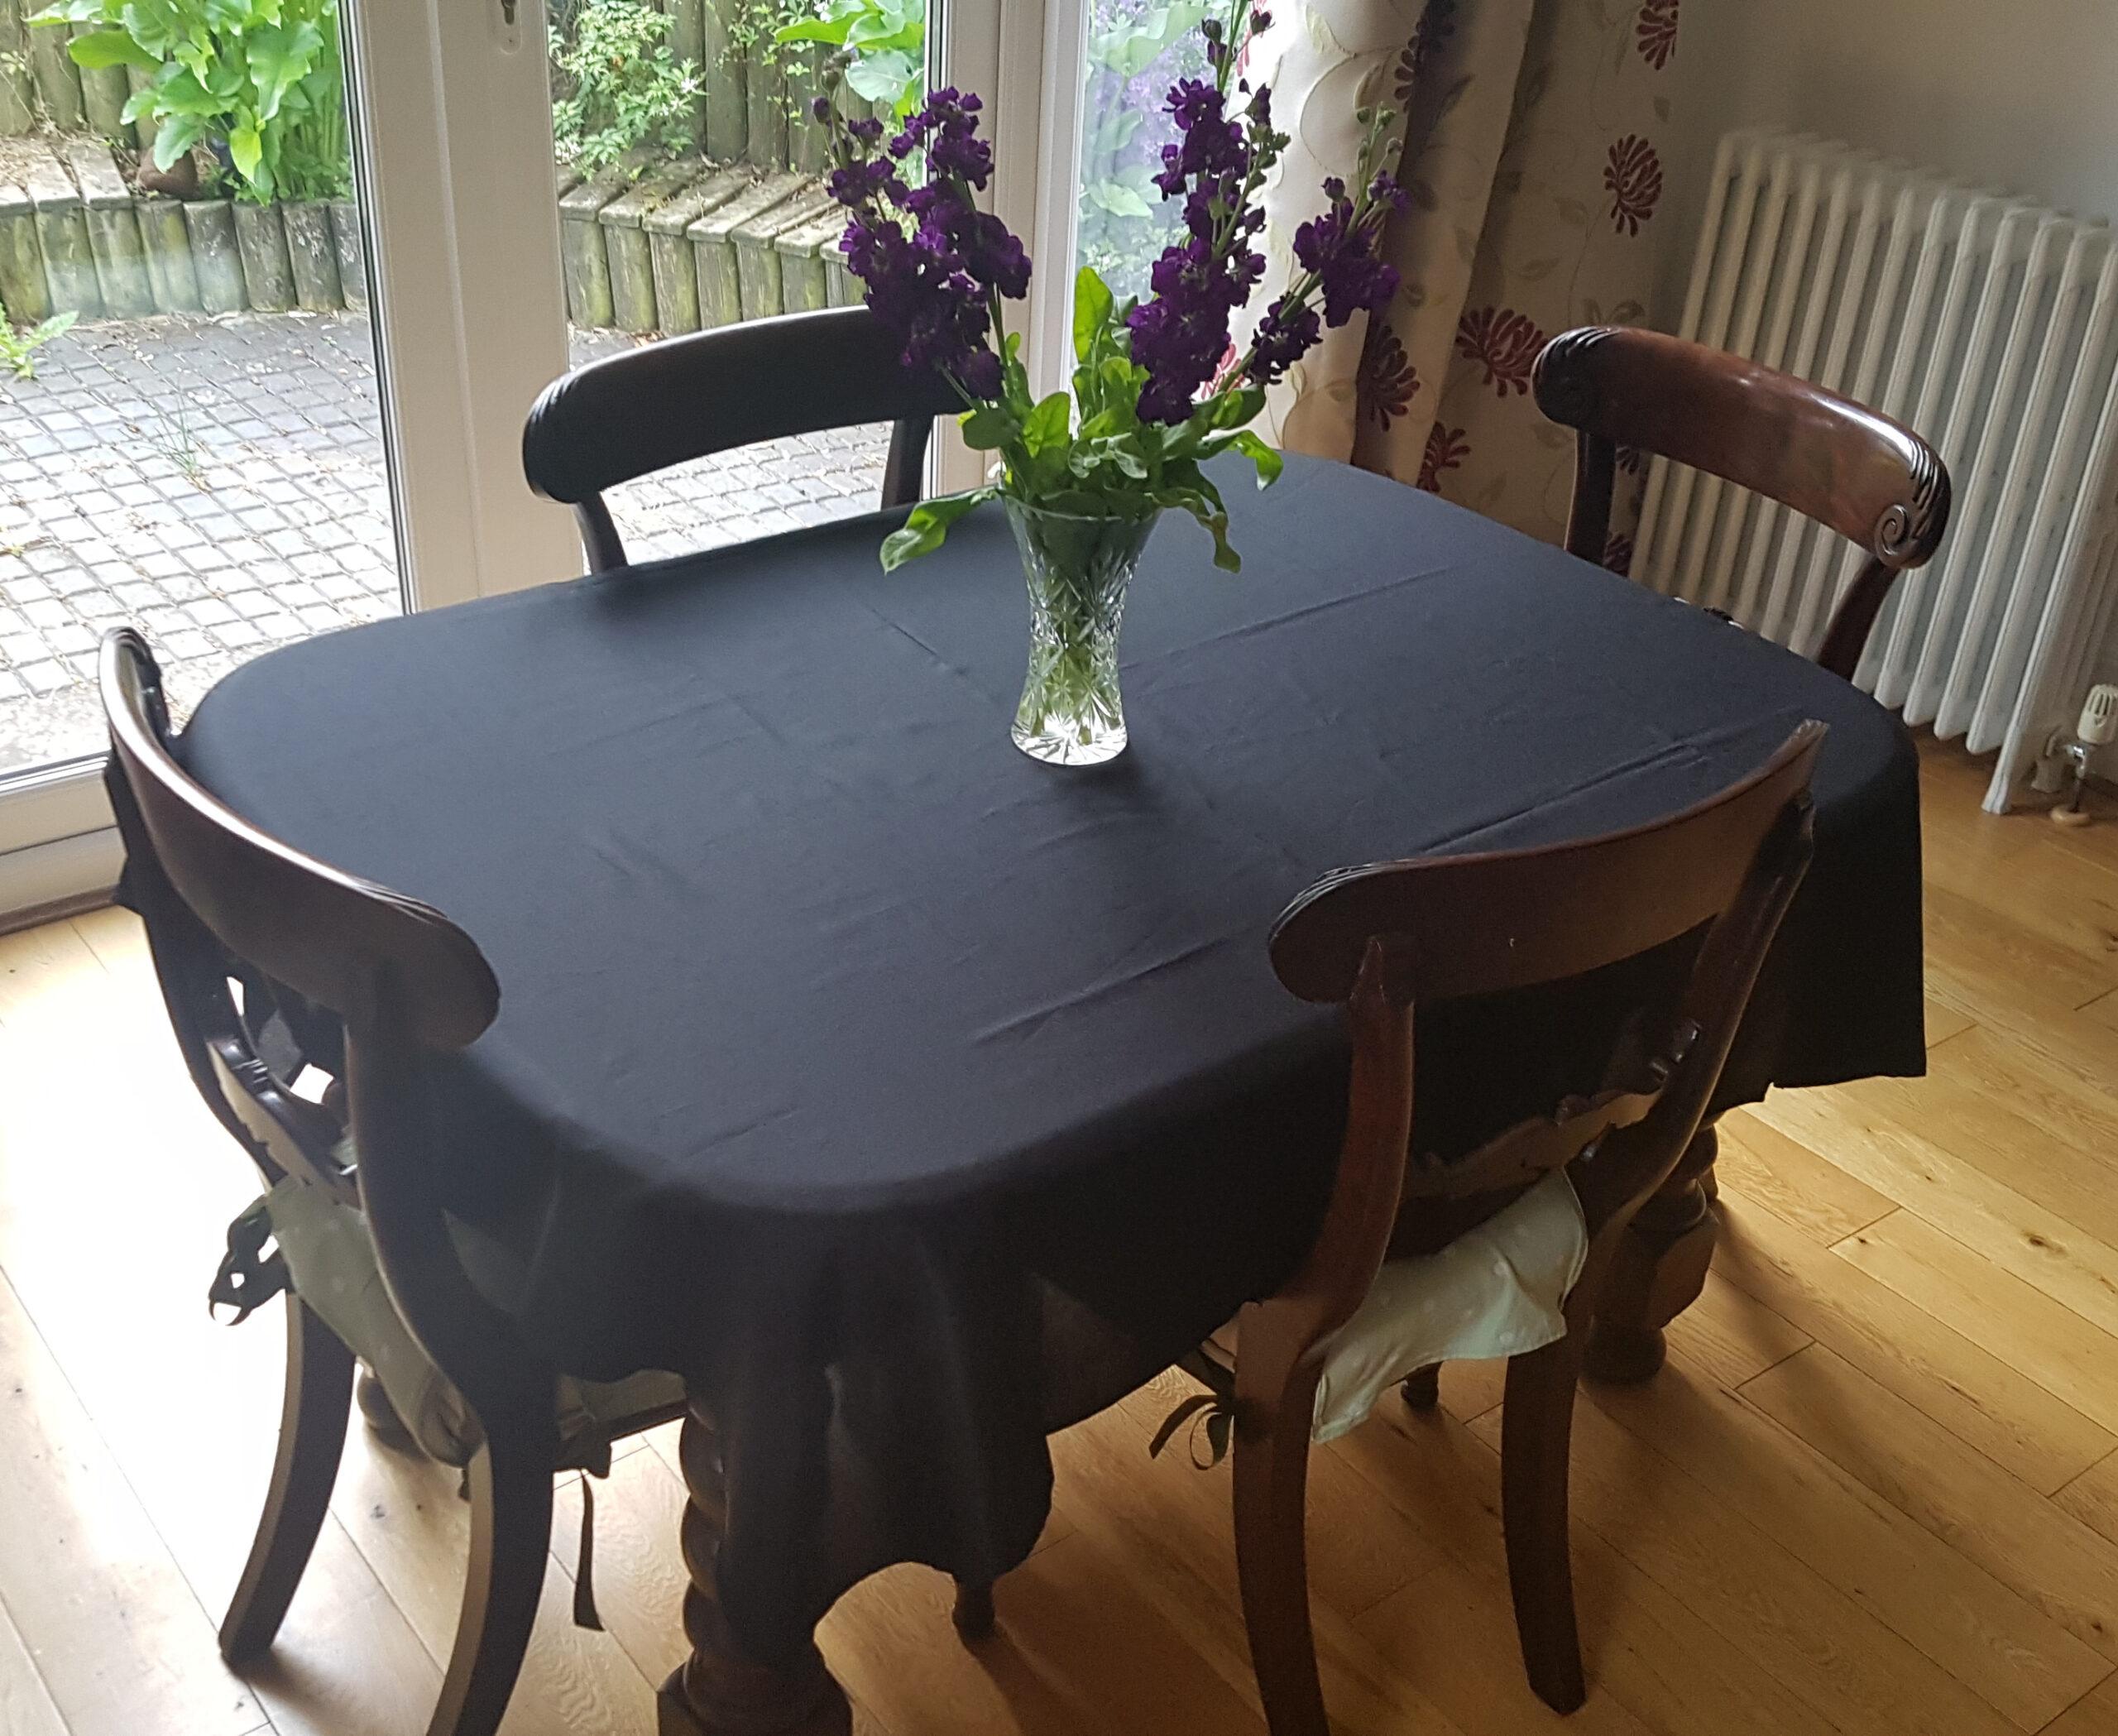 Large Deluxe Tablecloth, Stain Resistant Terylene Twill Plain, 4-6 settings, 142x142cm, Black